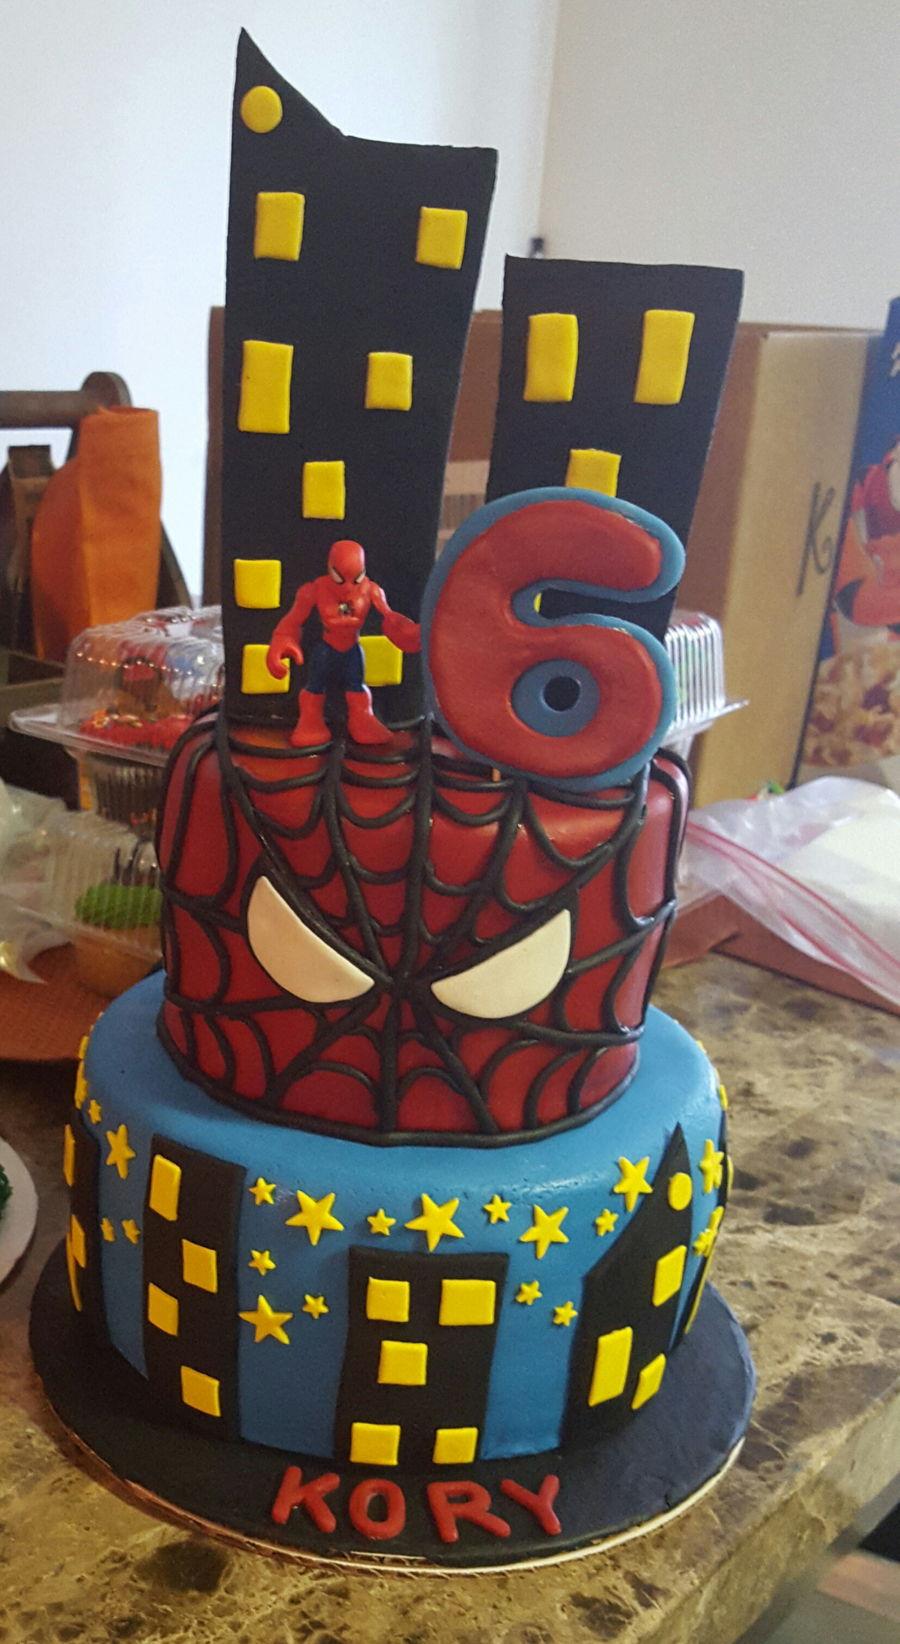 Vanilla Cake Decor : Spiderman Cake - CakeCentral.com